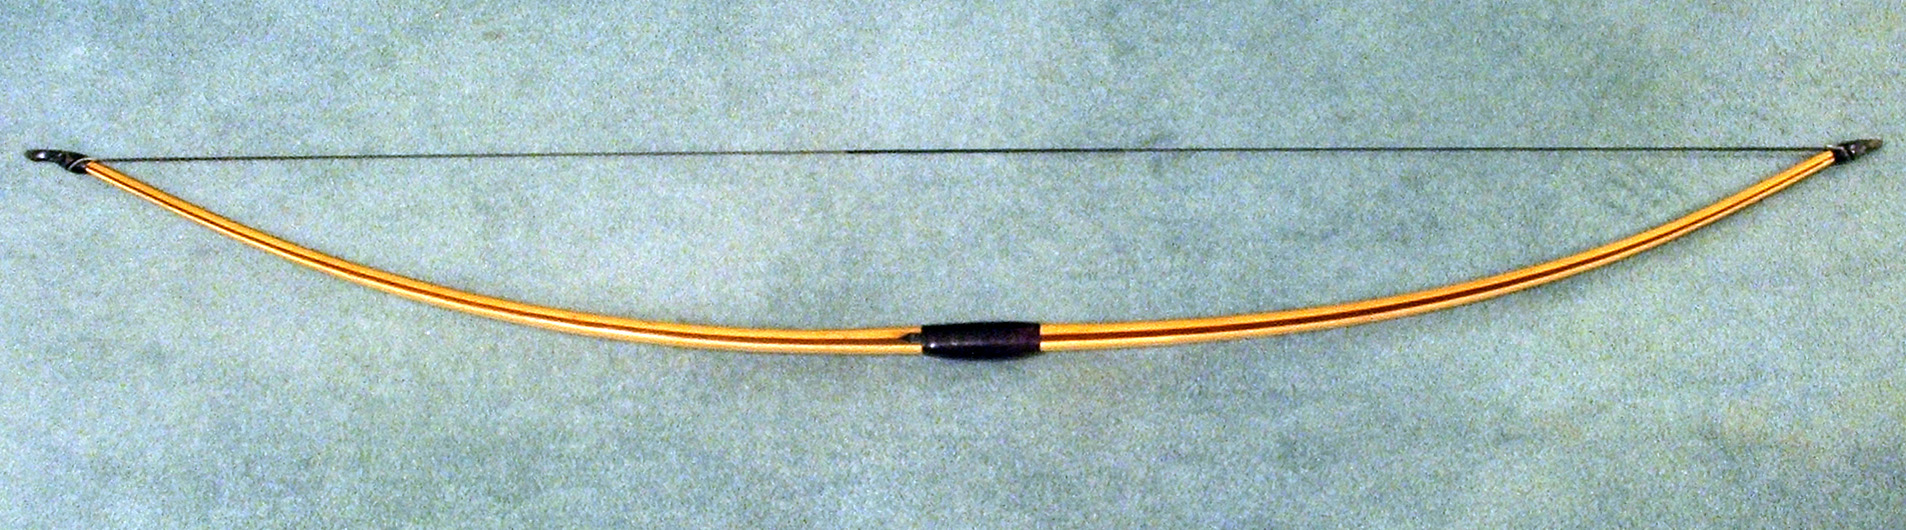 Longbow.jpg